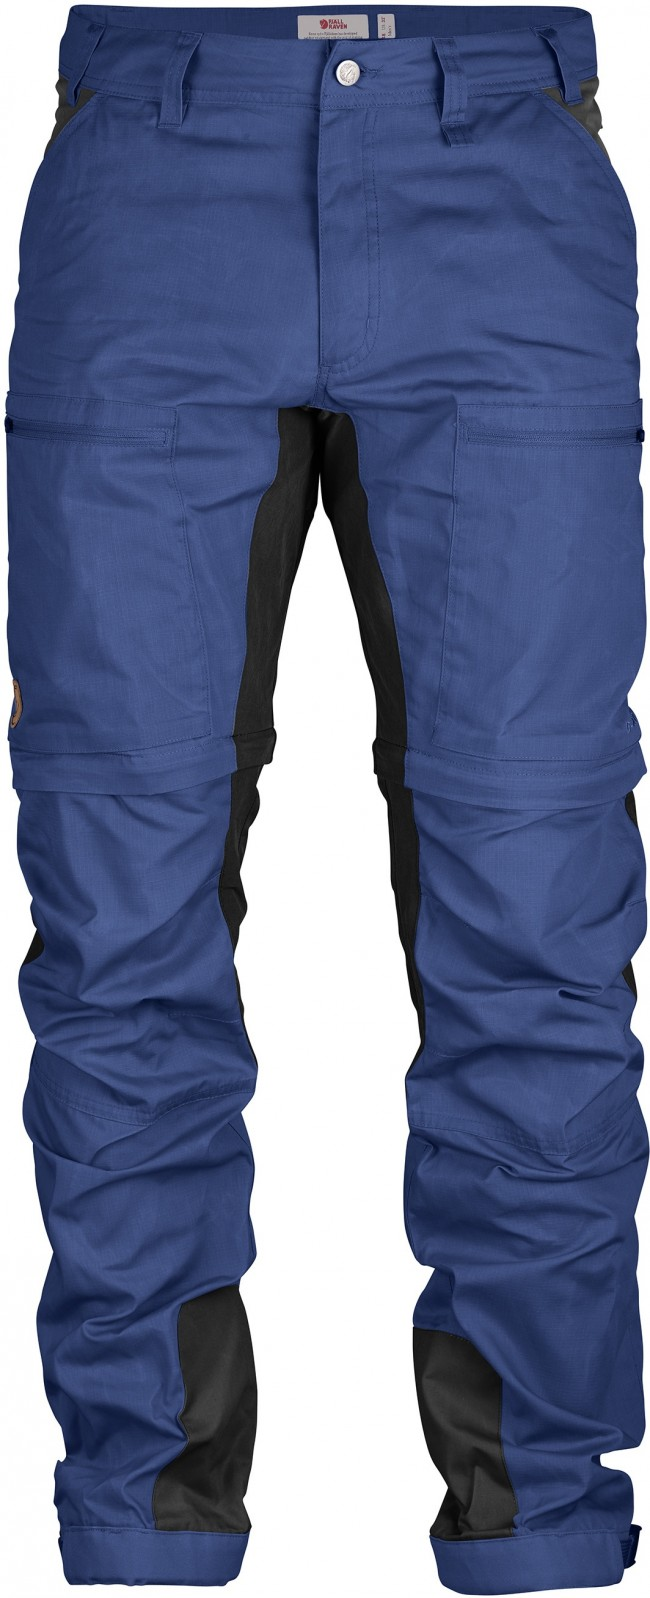 FjallRaven Abisko Lite Trekking Zip Off Trousers Long Deep